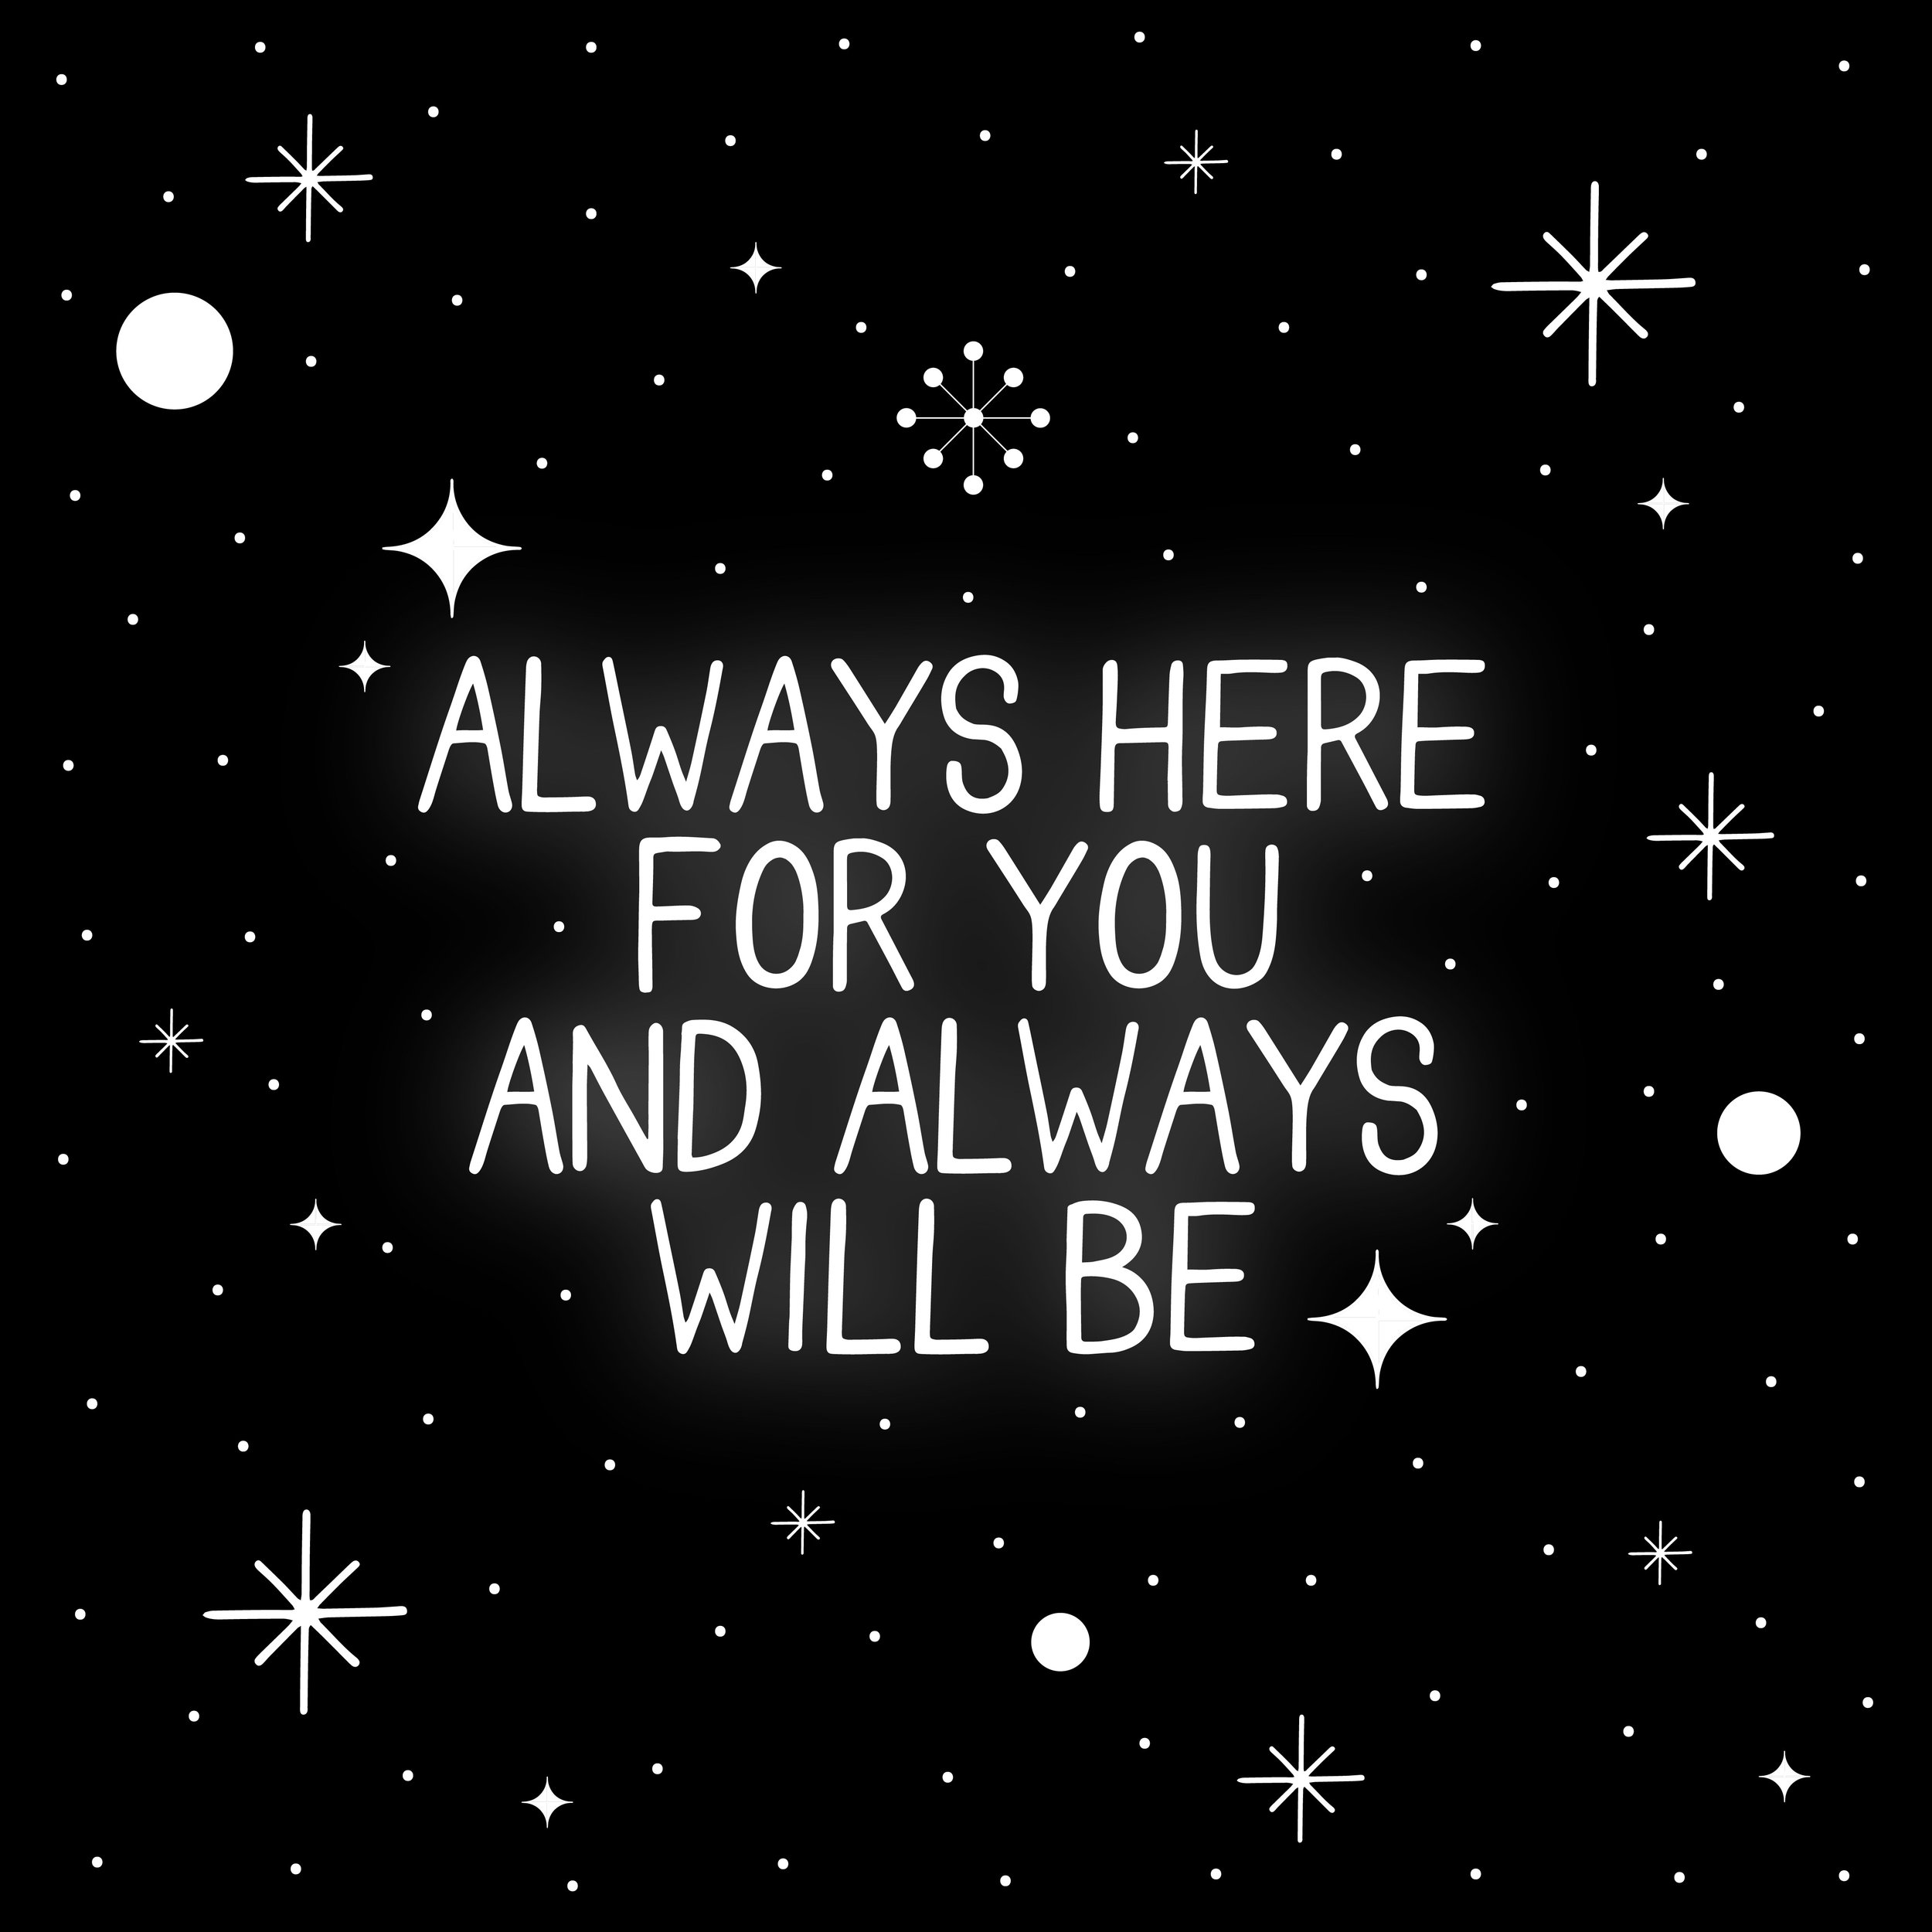 alwayshereforyou-01.jpg